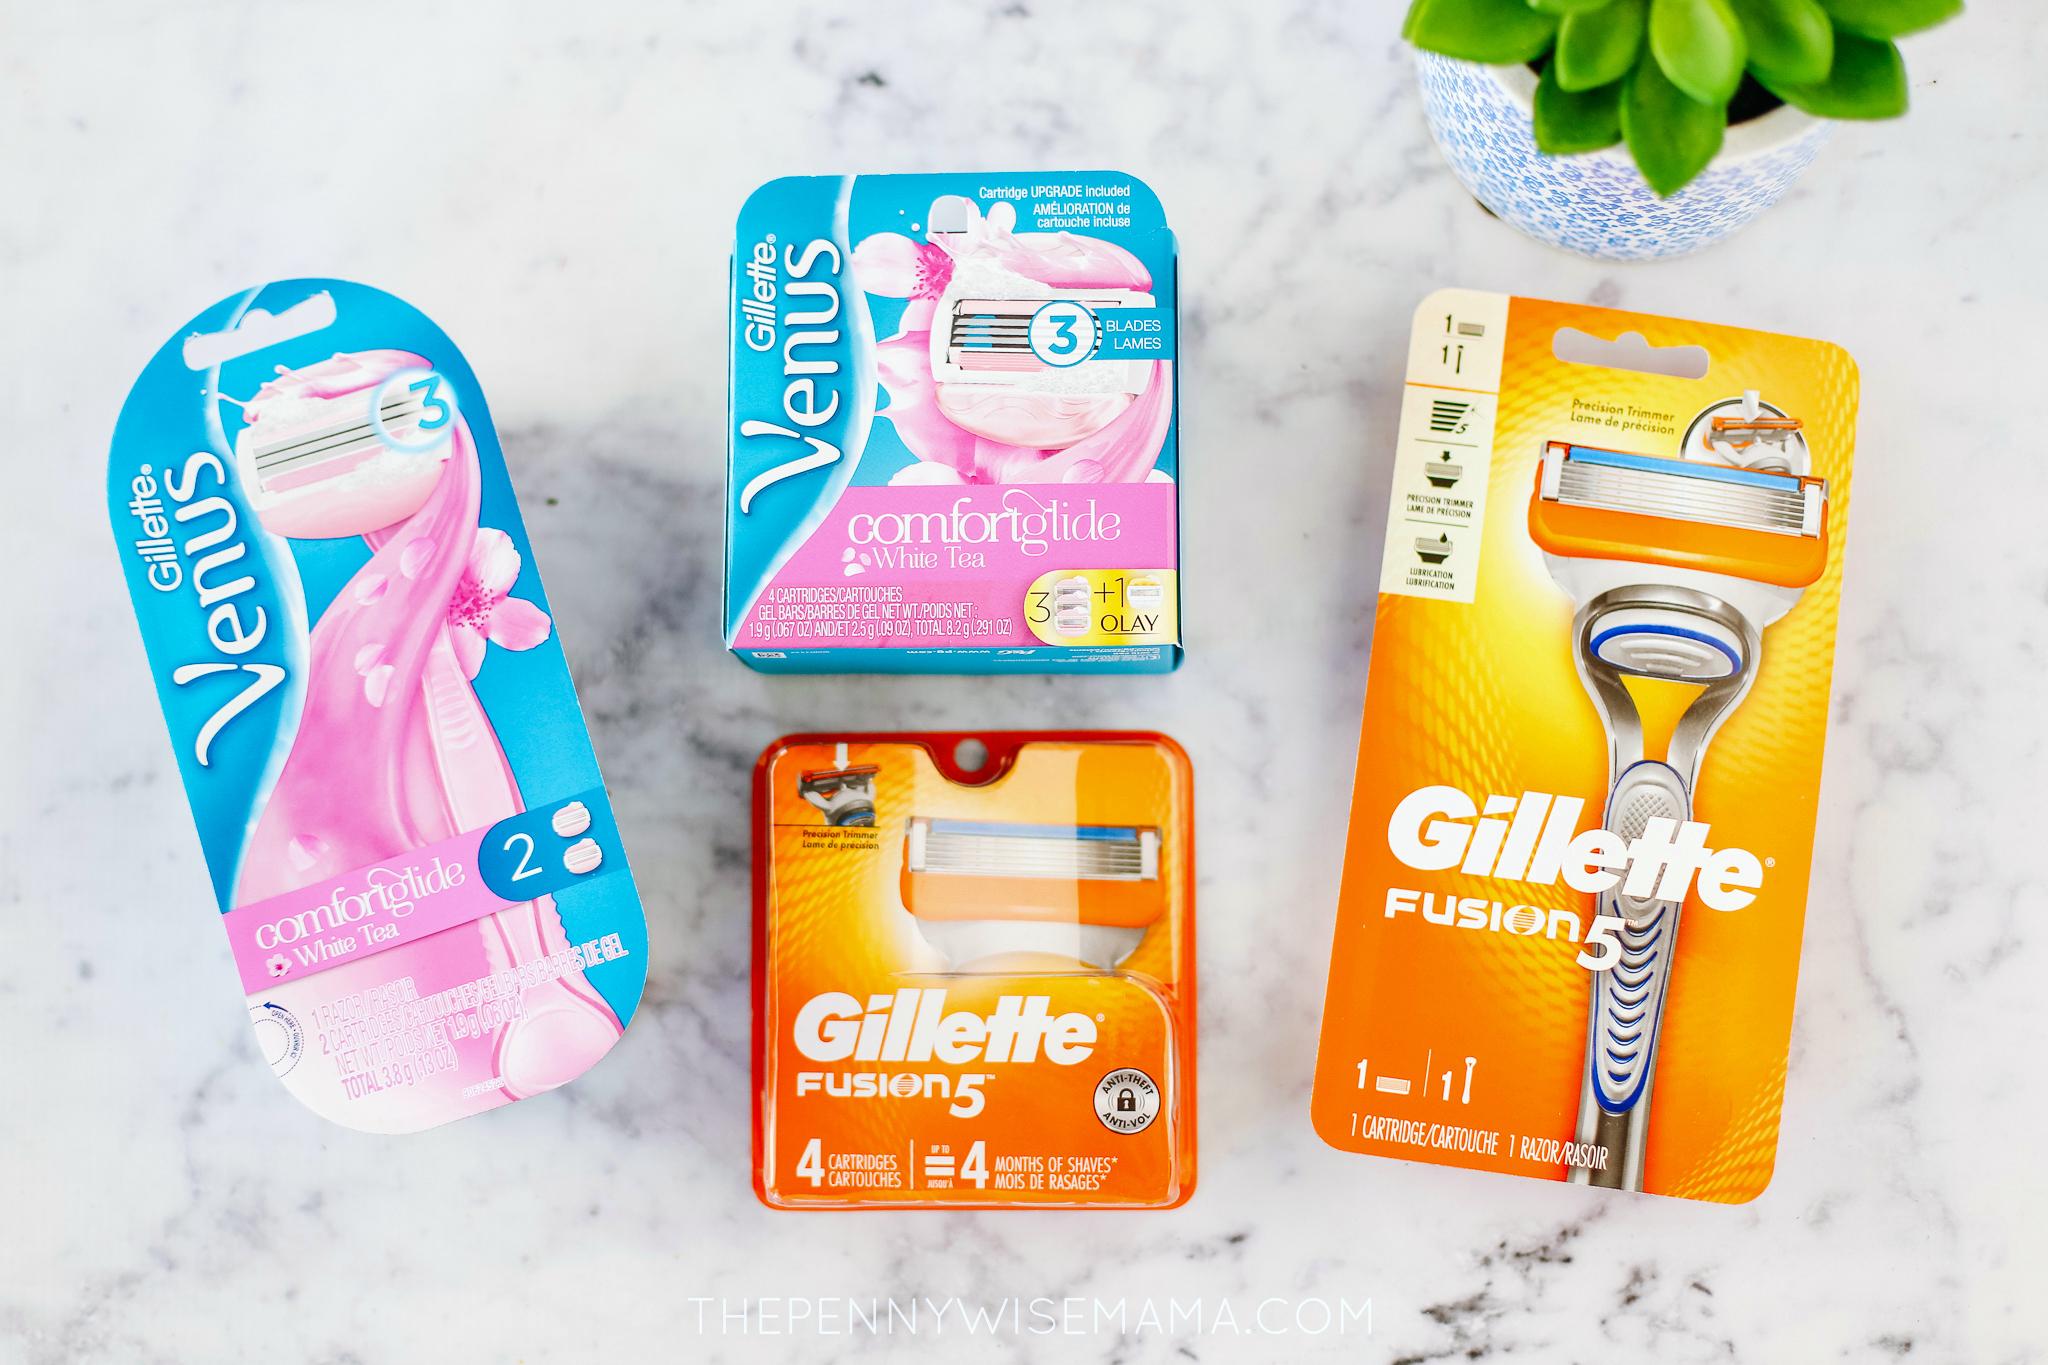 Gillette Fusion 5 and Venus Razor Coupons